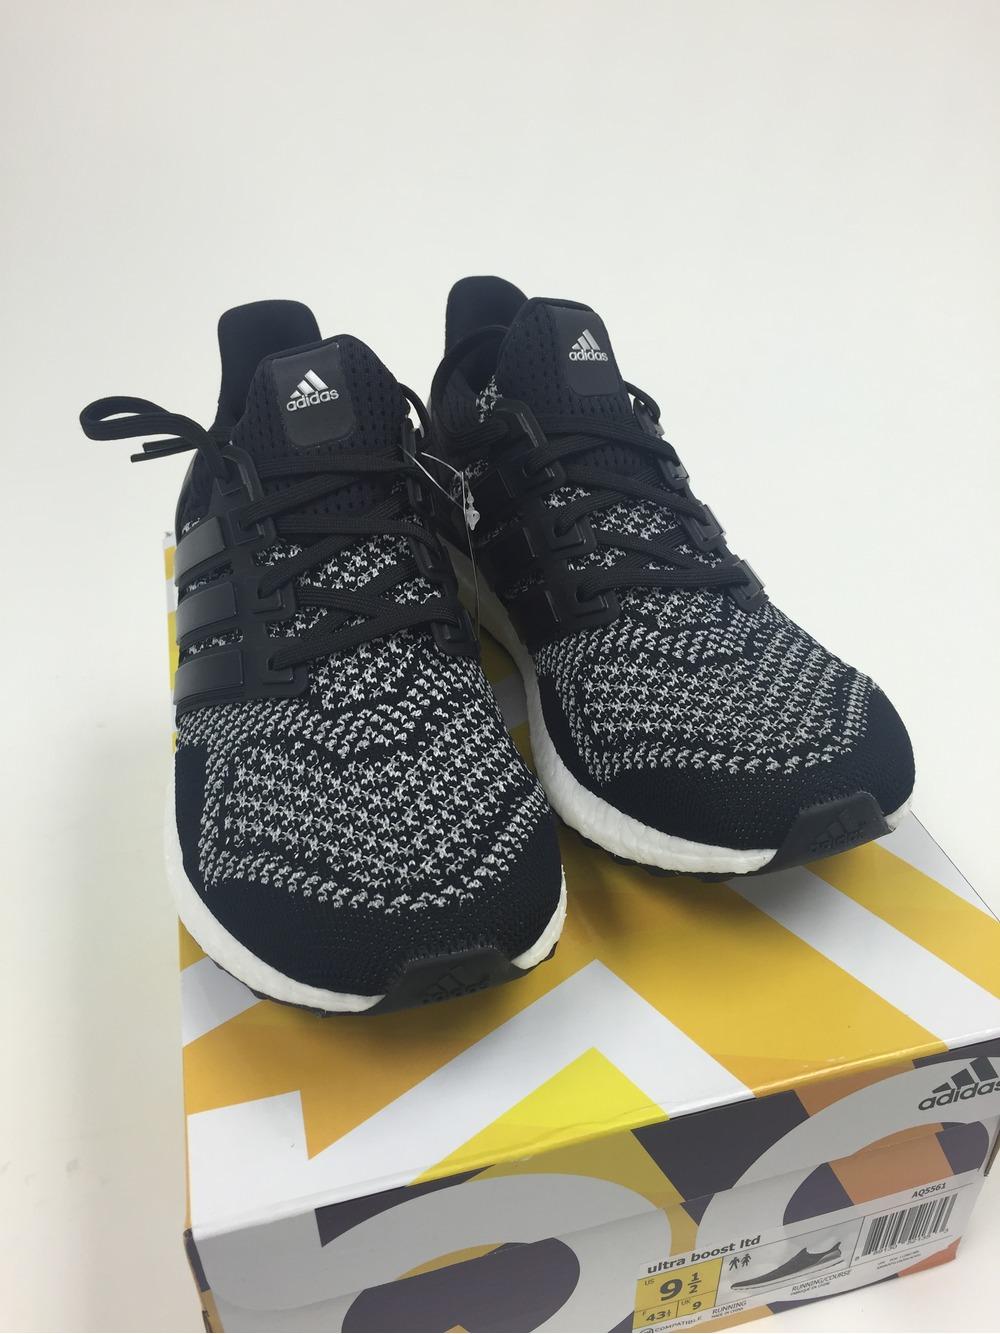 2be7aca8f1f1c shopping adidas ultra boost black 9.5 941ce a7cea